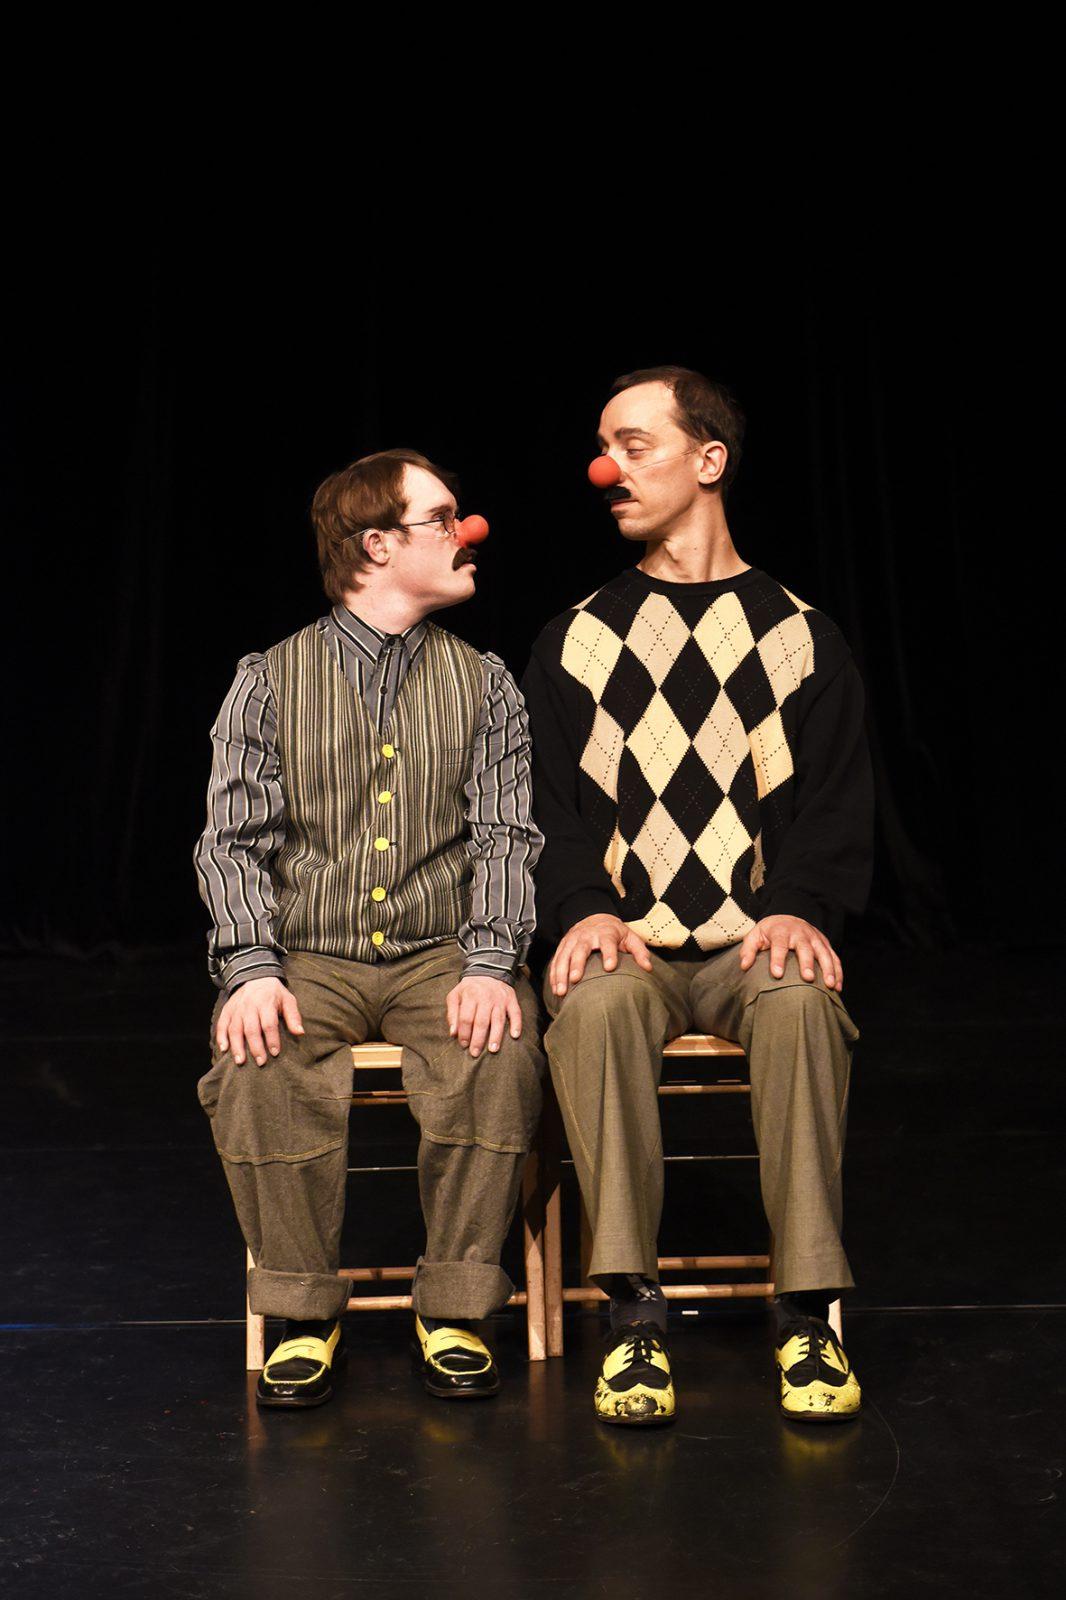 zwei Clowns sitzend